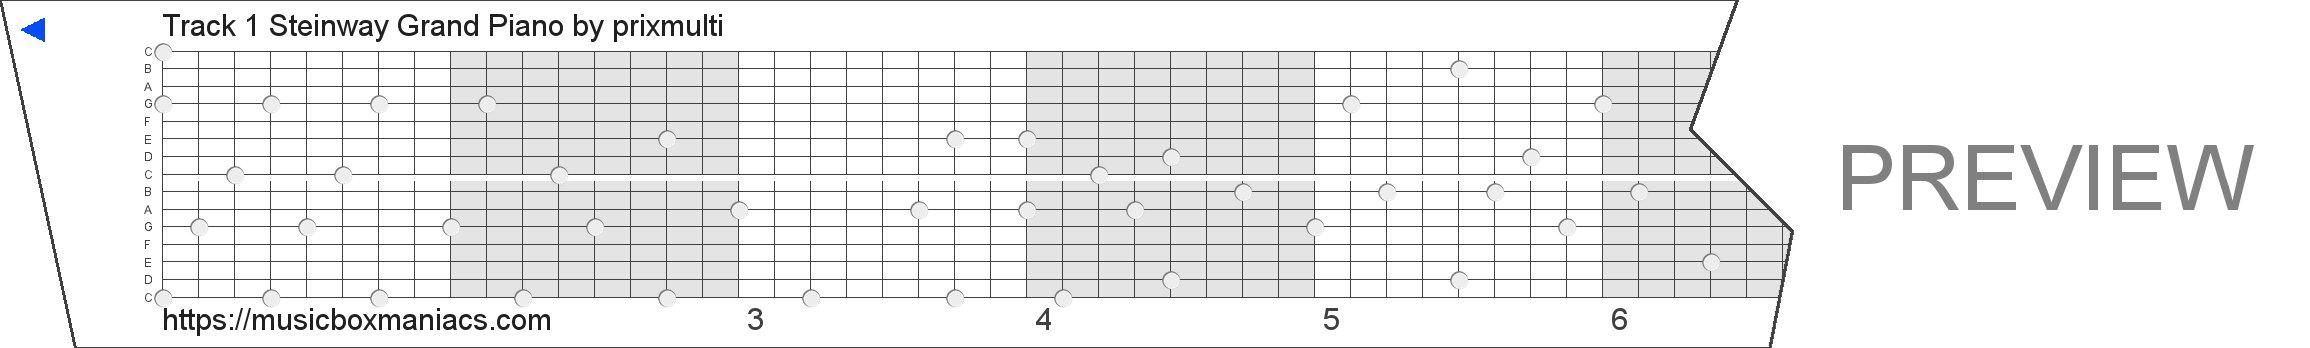 Track 1 Steinway Grand Piano 15 note music box paper strip